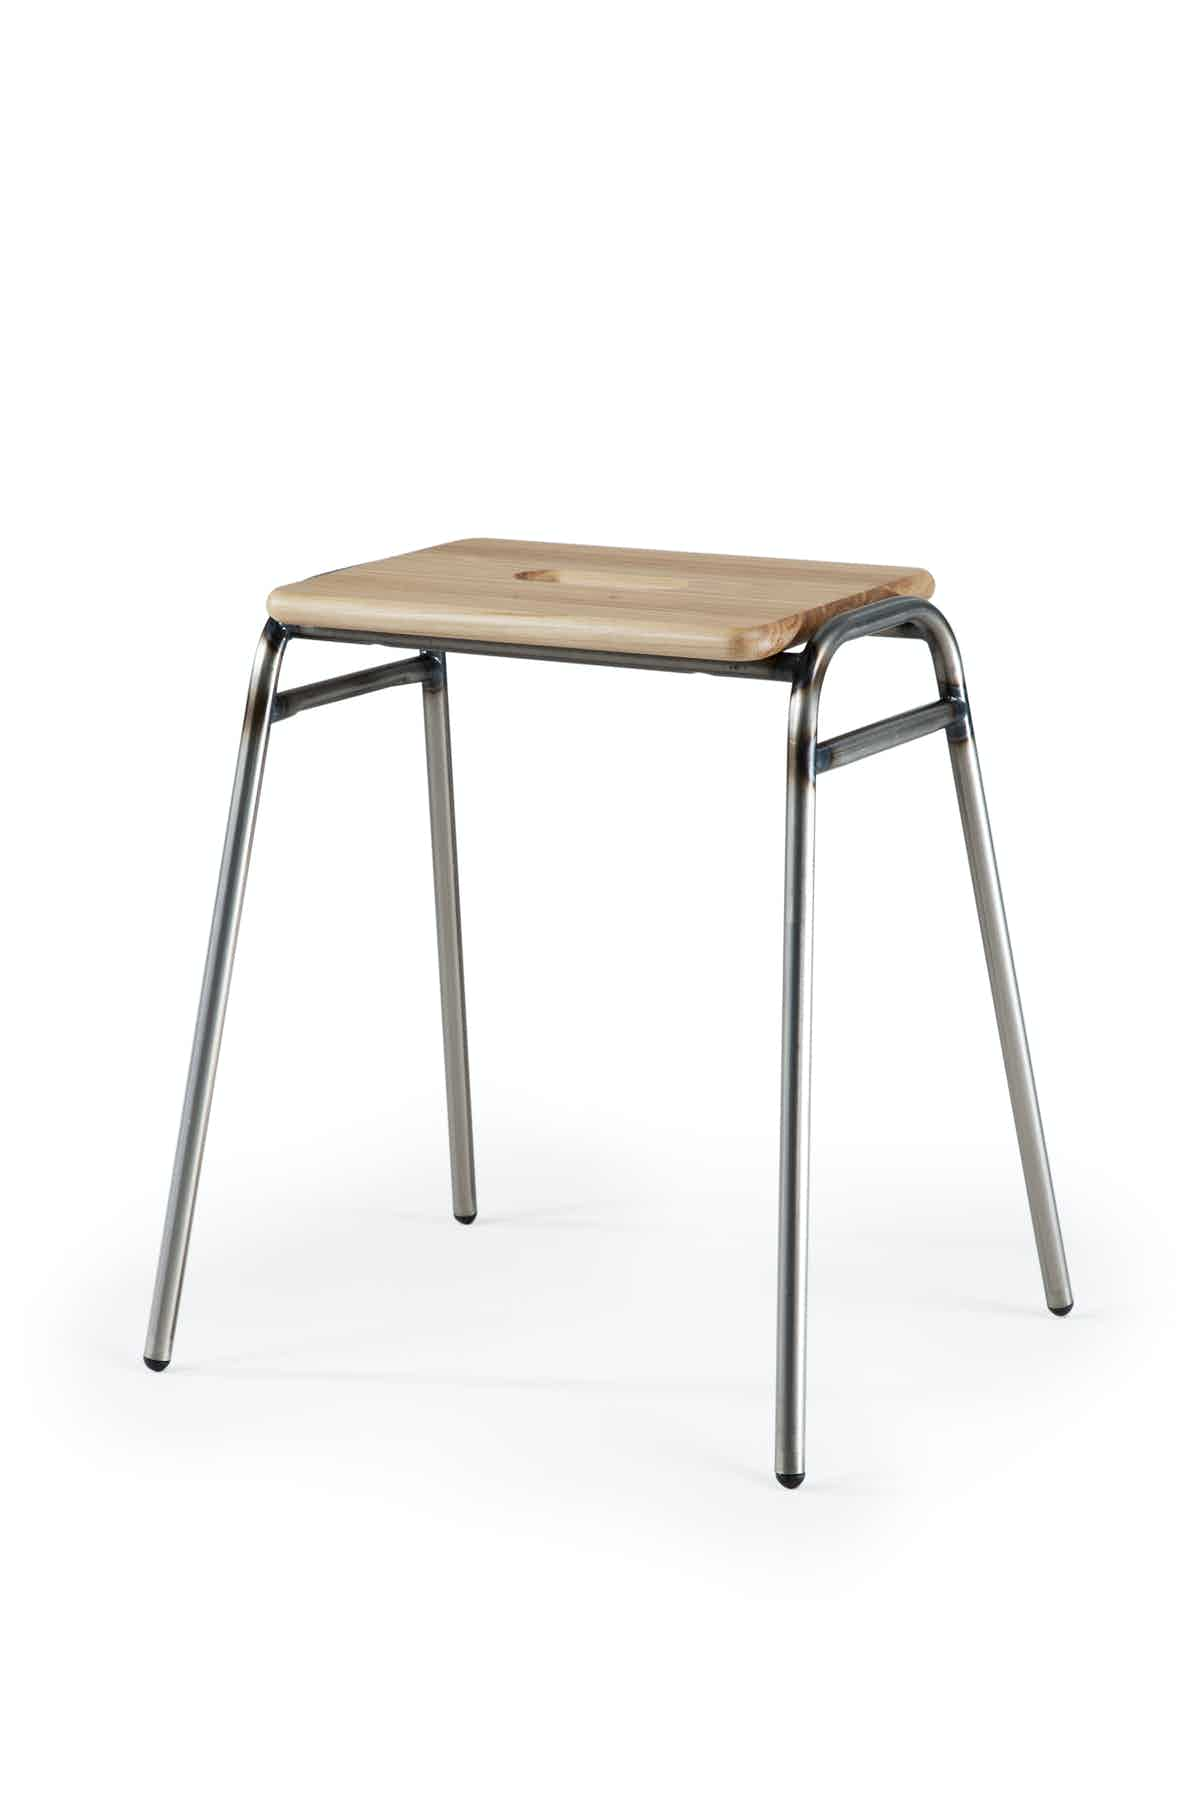 Deadgood-working-girl-stool-hard-low-angle-haute-living